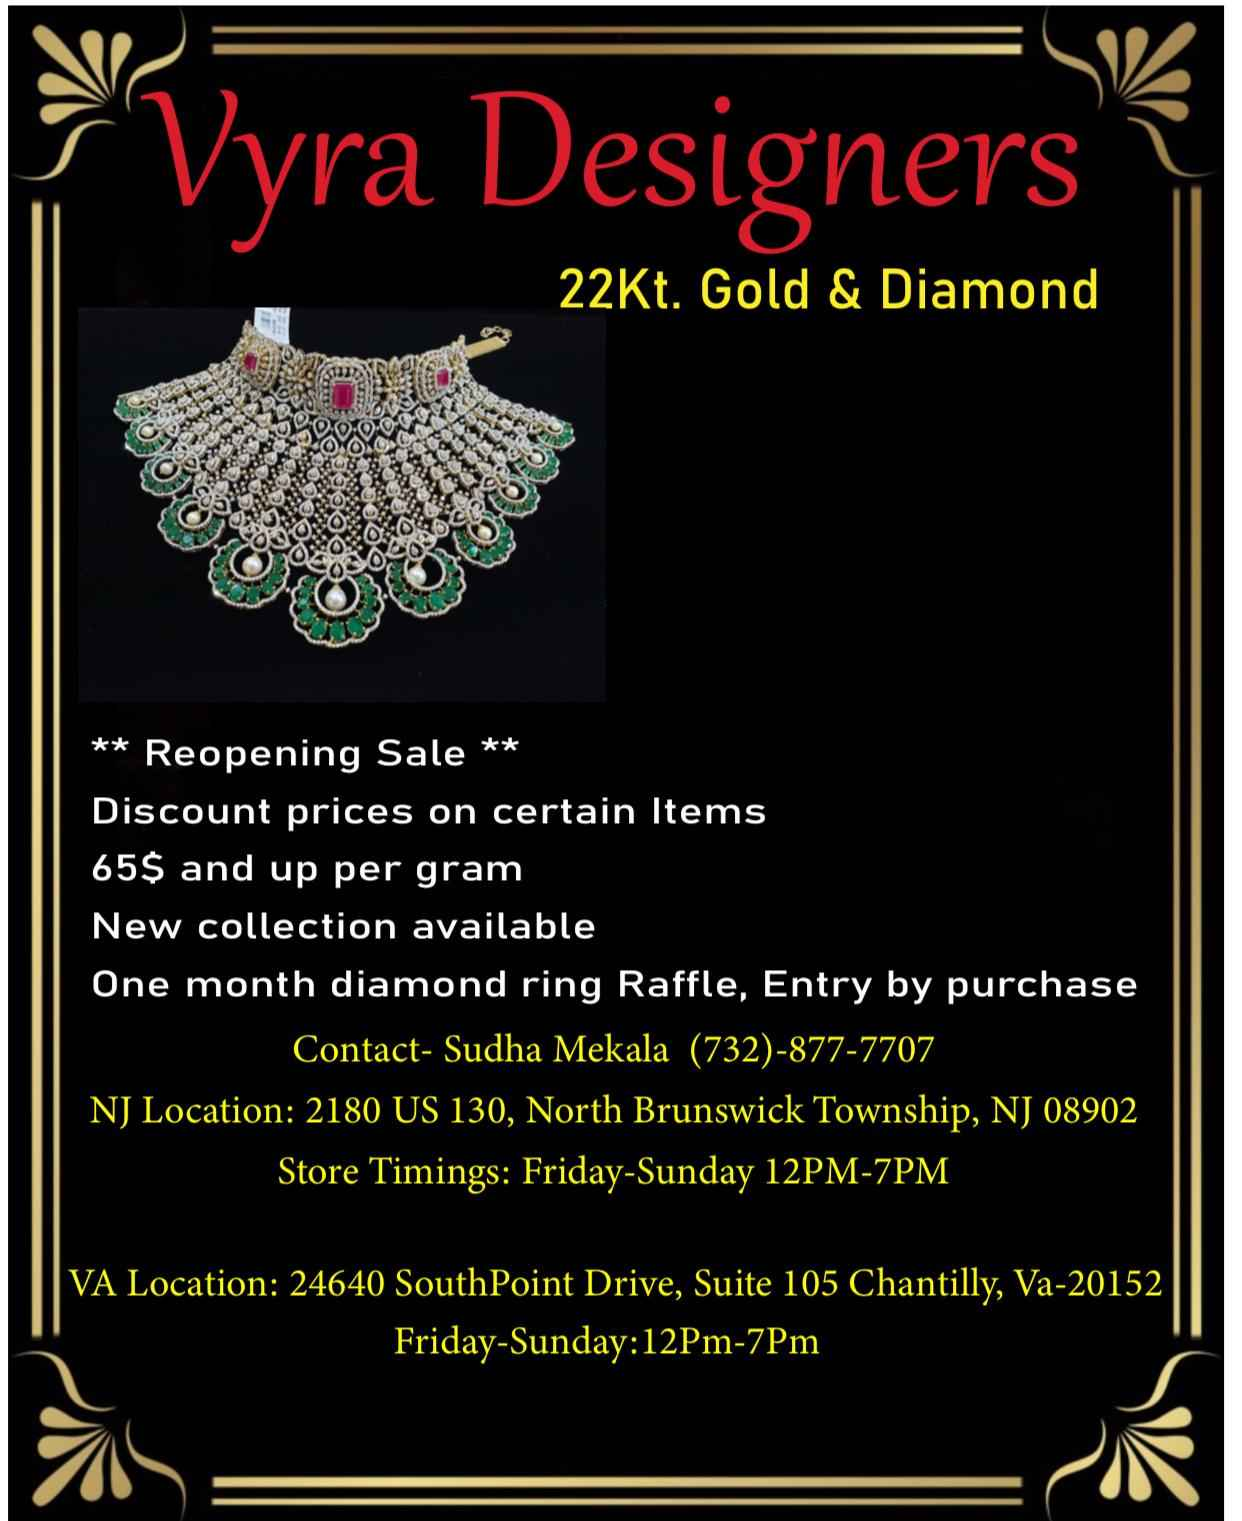 Vyra Designers - 22Kt. Gold & Diamond